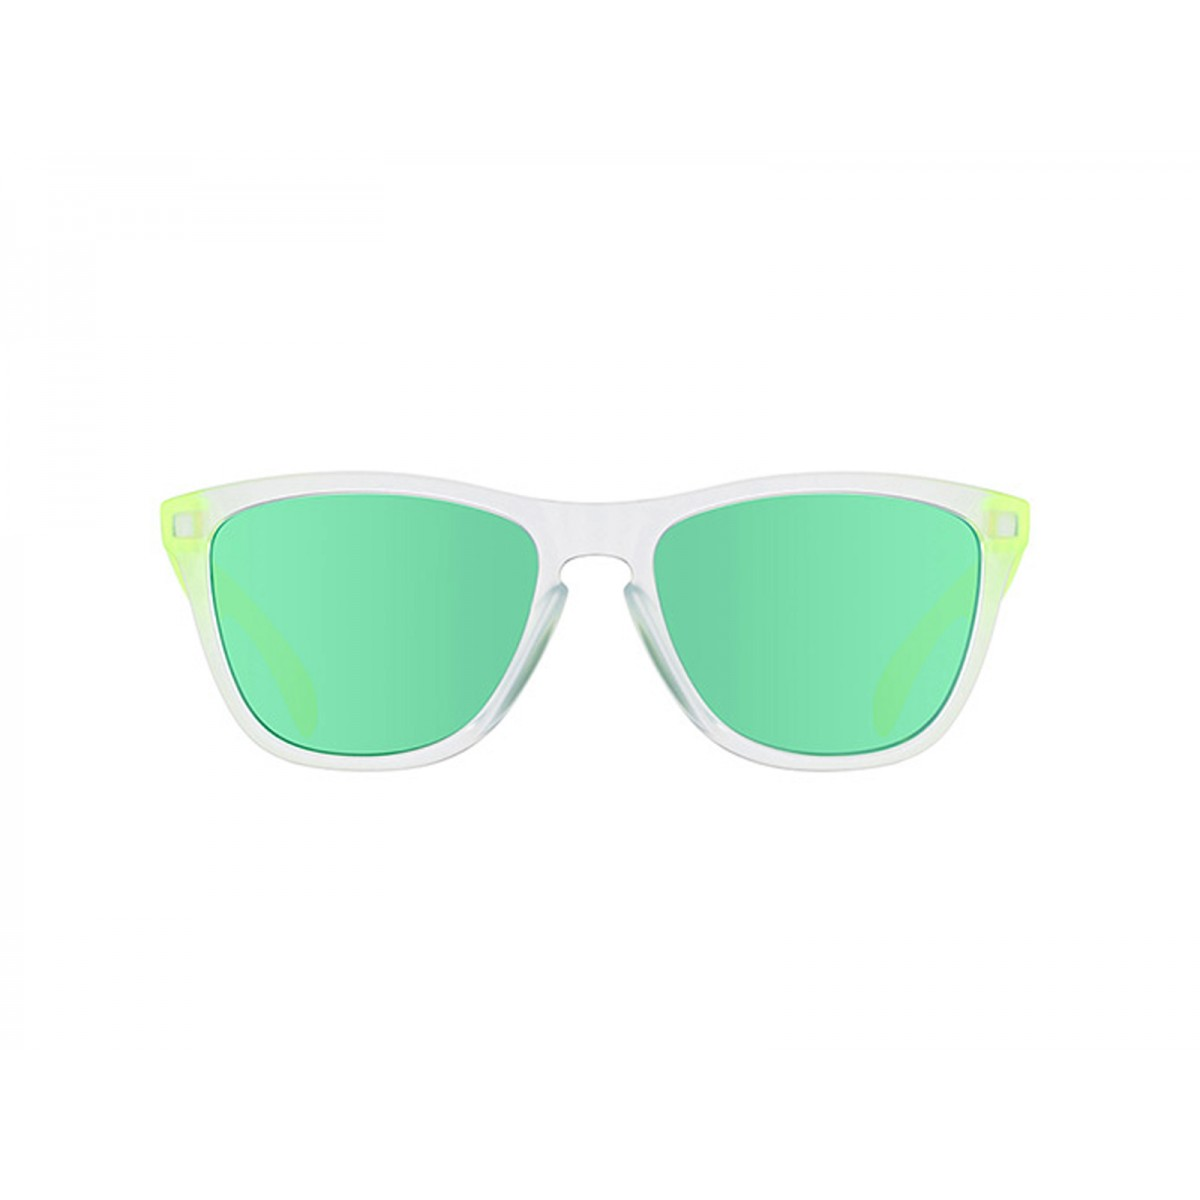 9826766e0d517 Oakley Frogskins Prizm Black Iridium Unisex Sunglasses OK-9013-9013C4-55